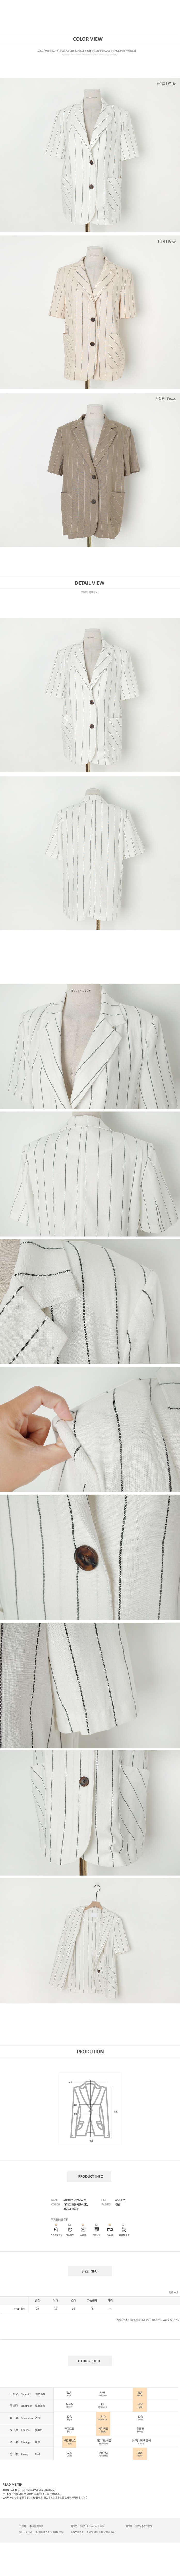 Sophisticated guaranteed linen jacket